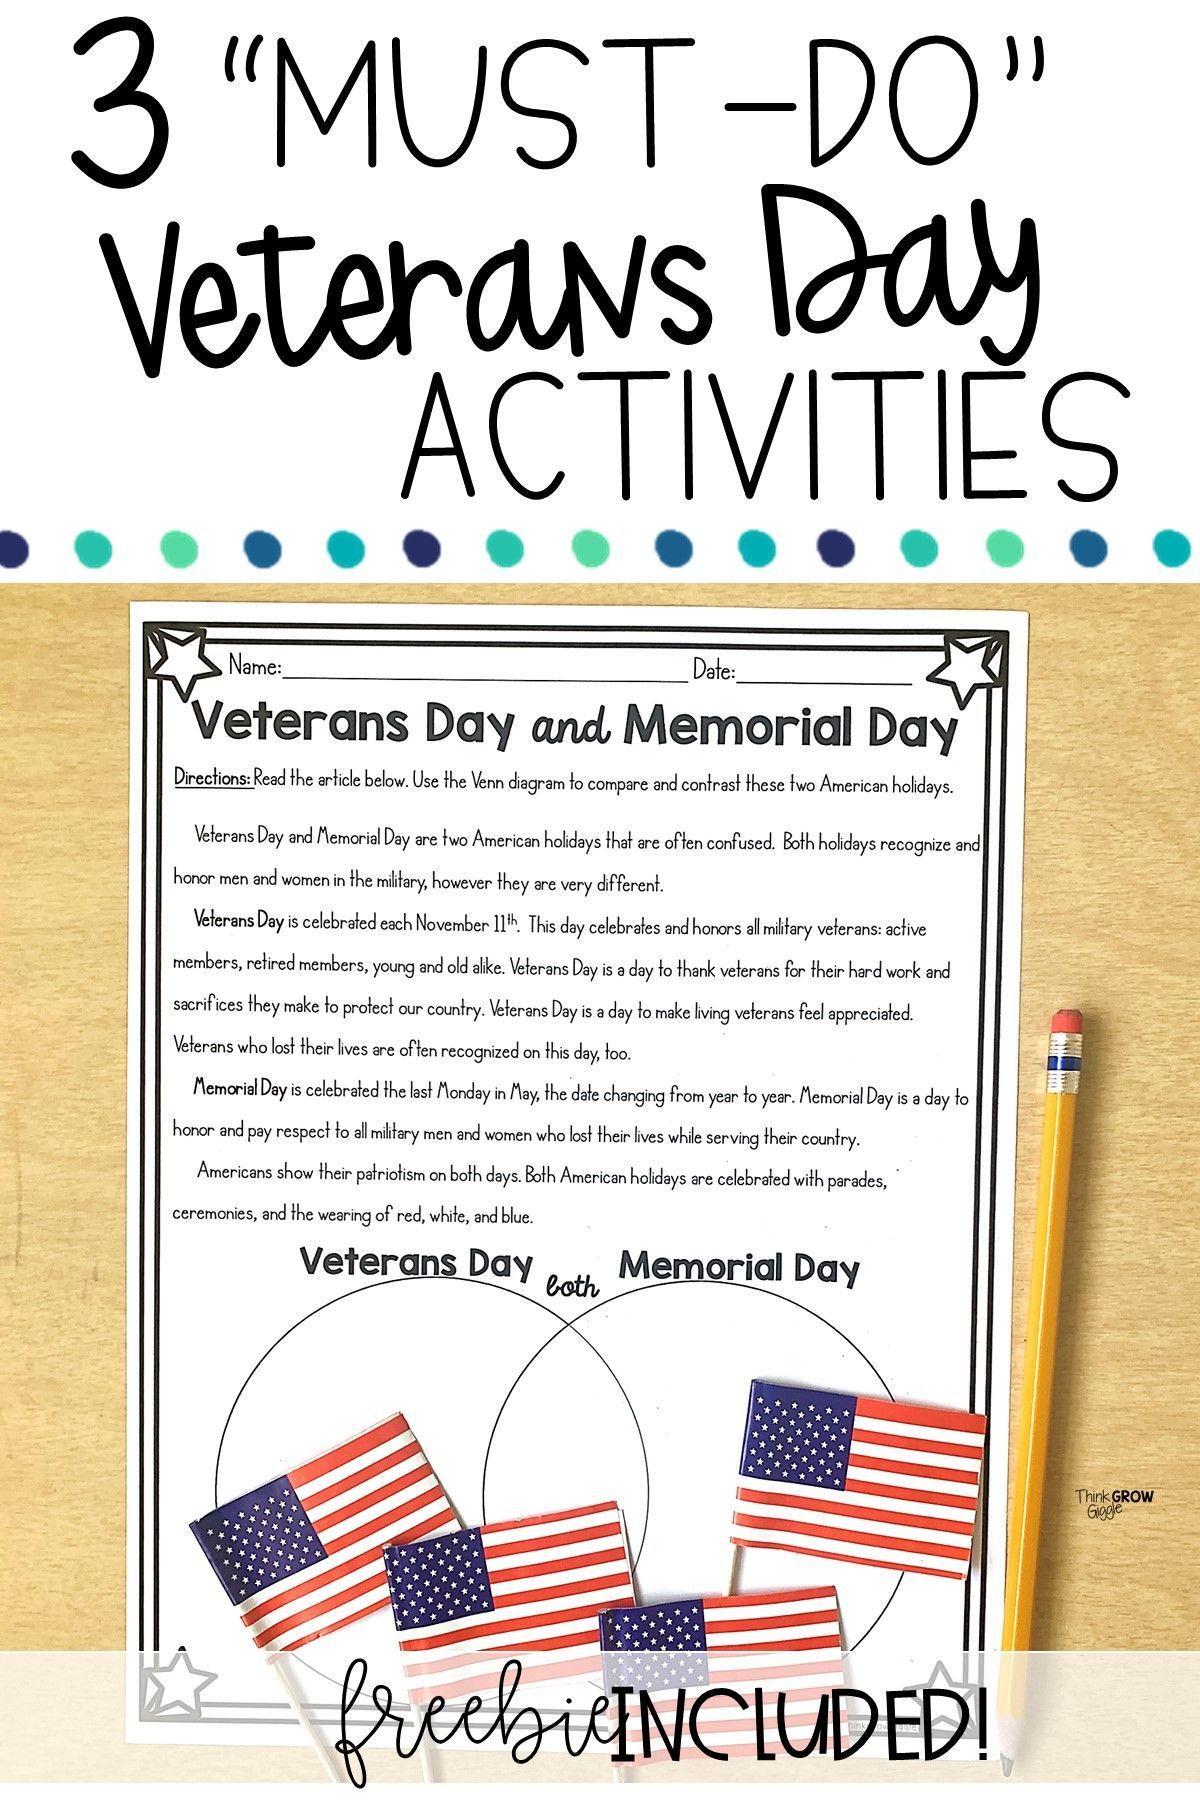 Veterans Day Activities For Kids Veteransdayartprojects